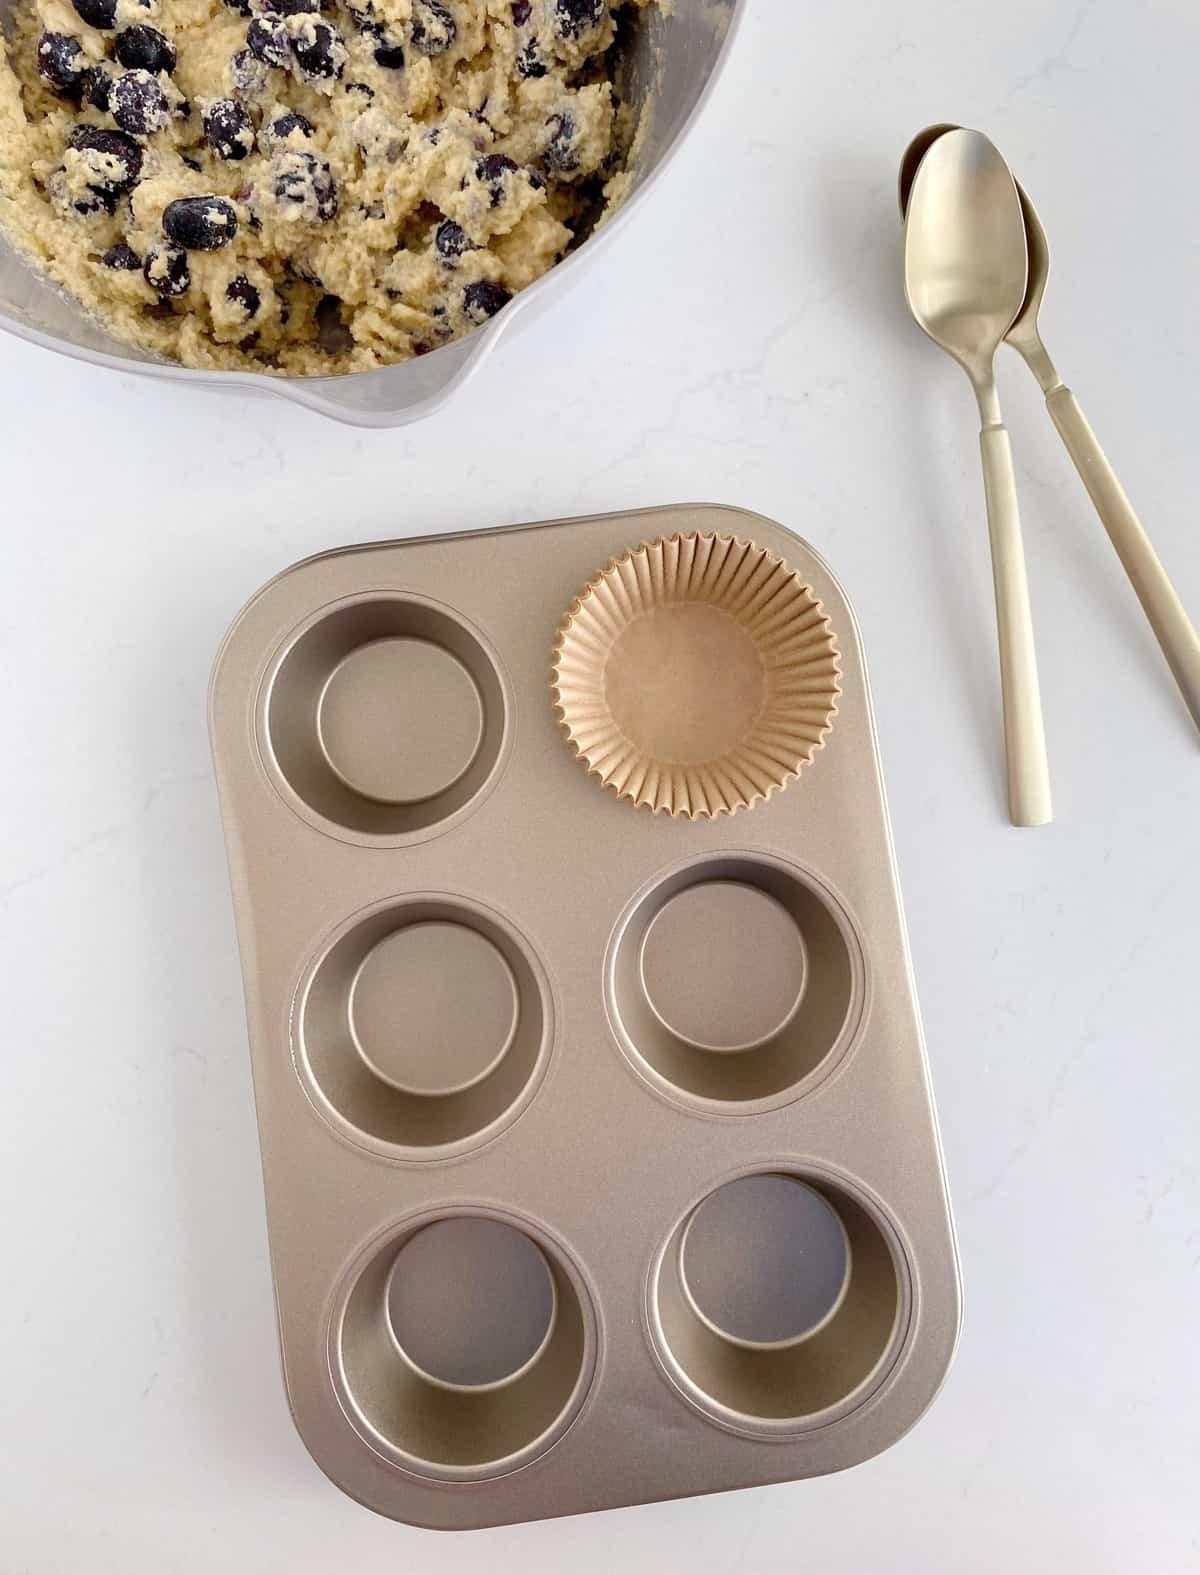 cupcake liner in tin